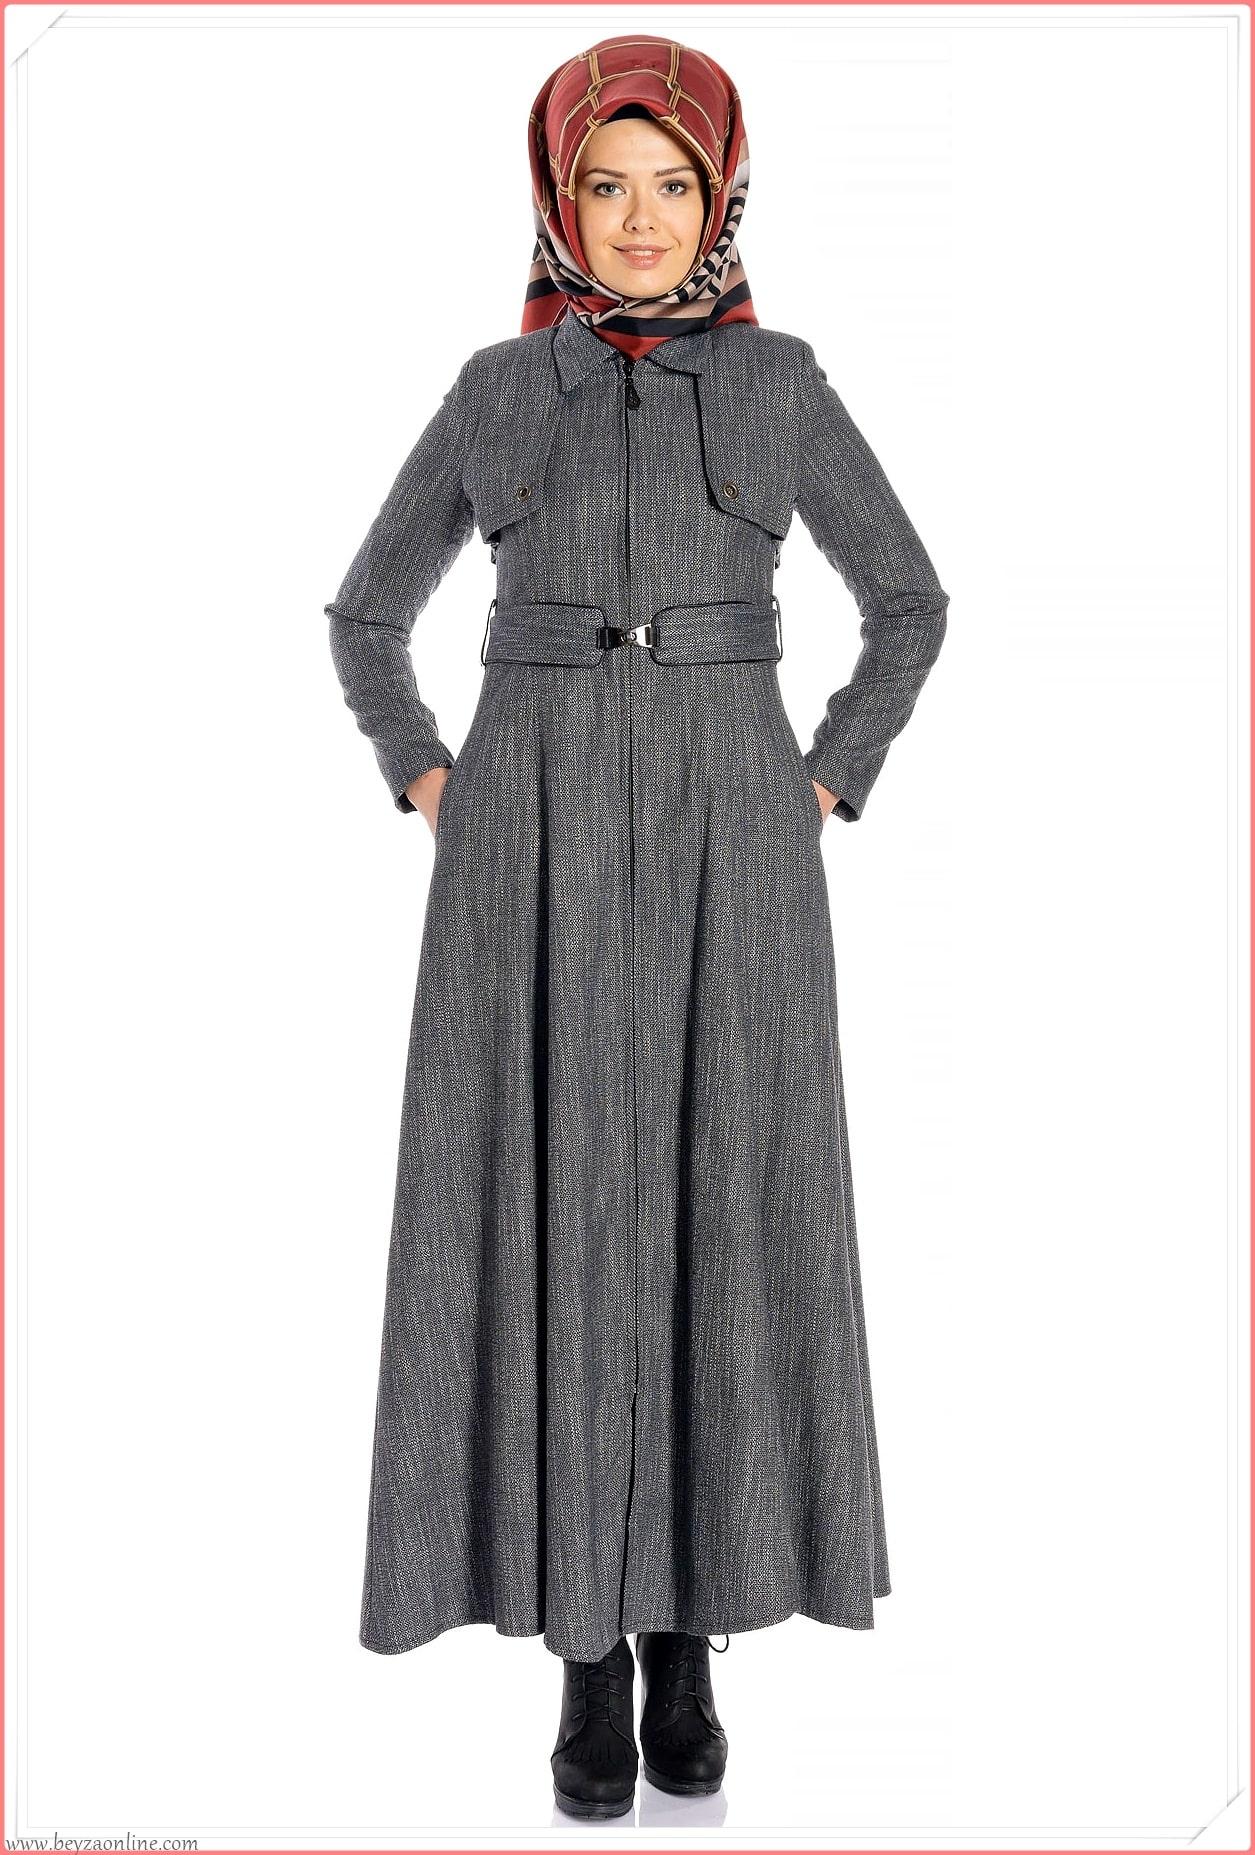 hijab ferace2021,hijab style abaya,ucuz feraceler 2021,indirimli ferace modelleri